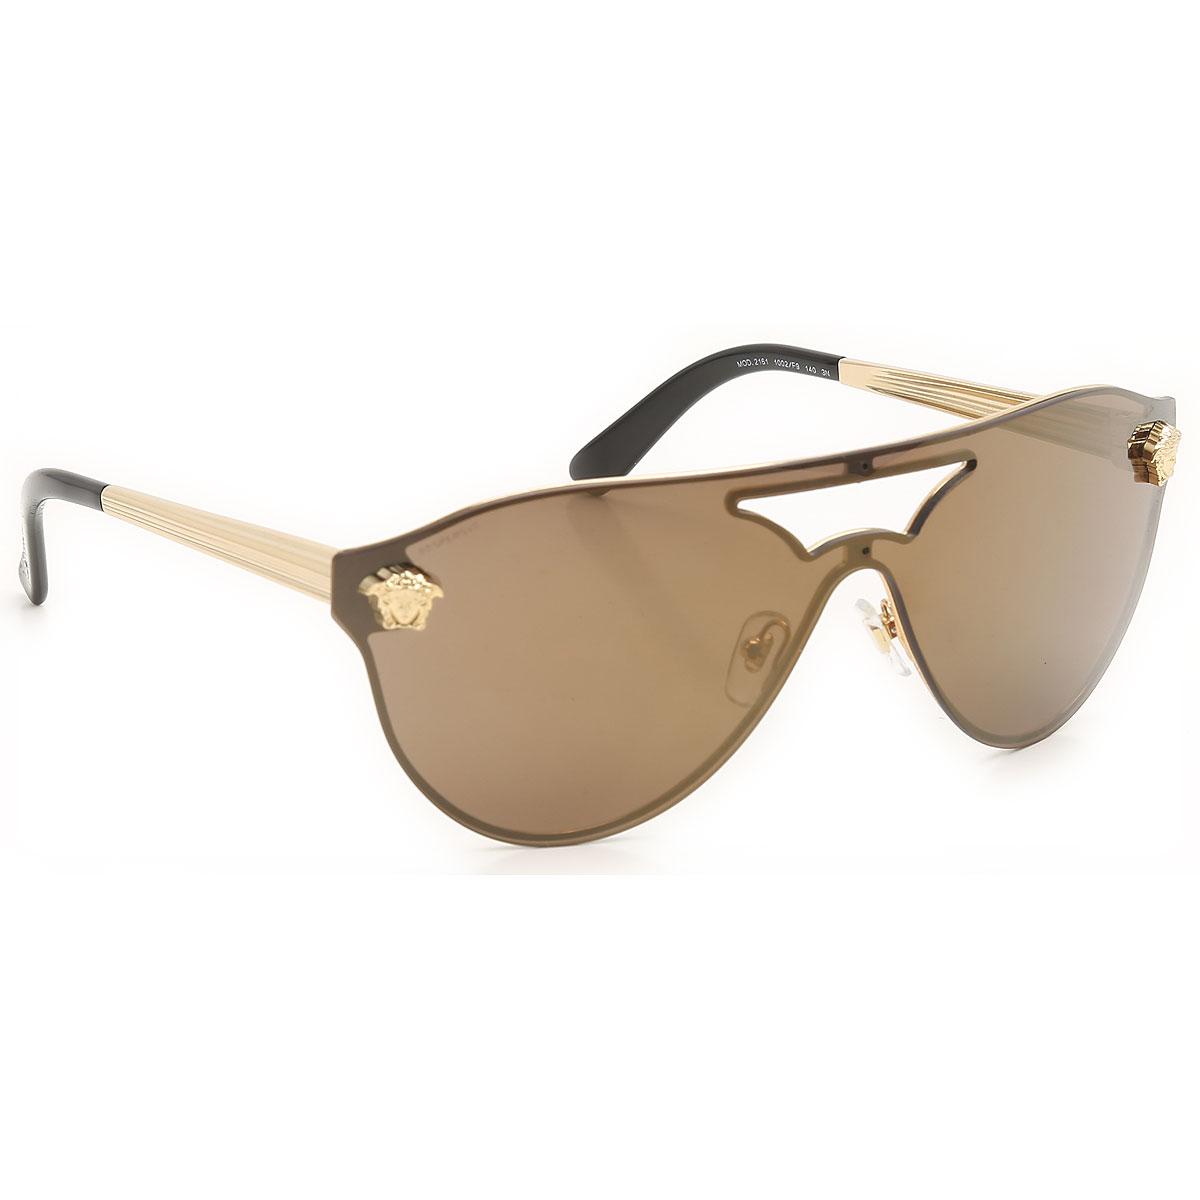 Gianni Versace Sunglasses On Sale, Garnet, 2019